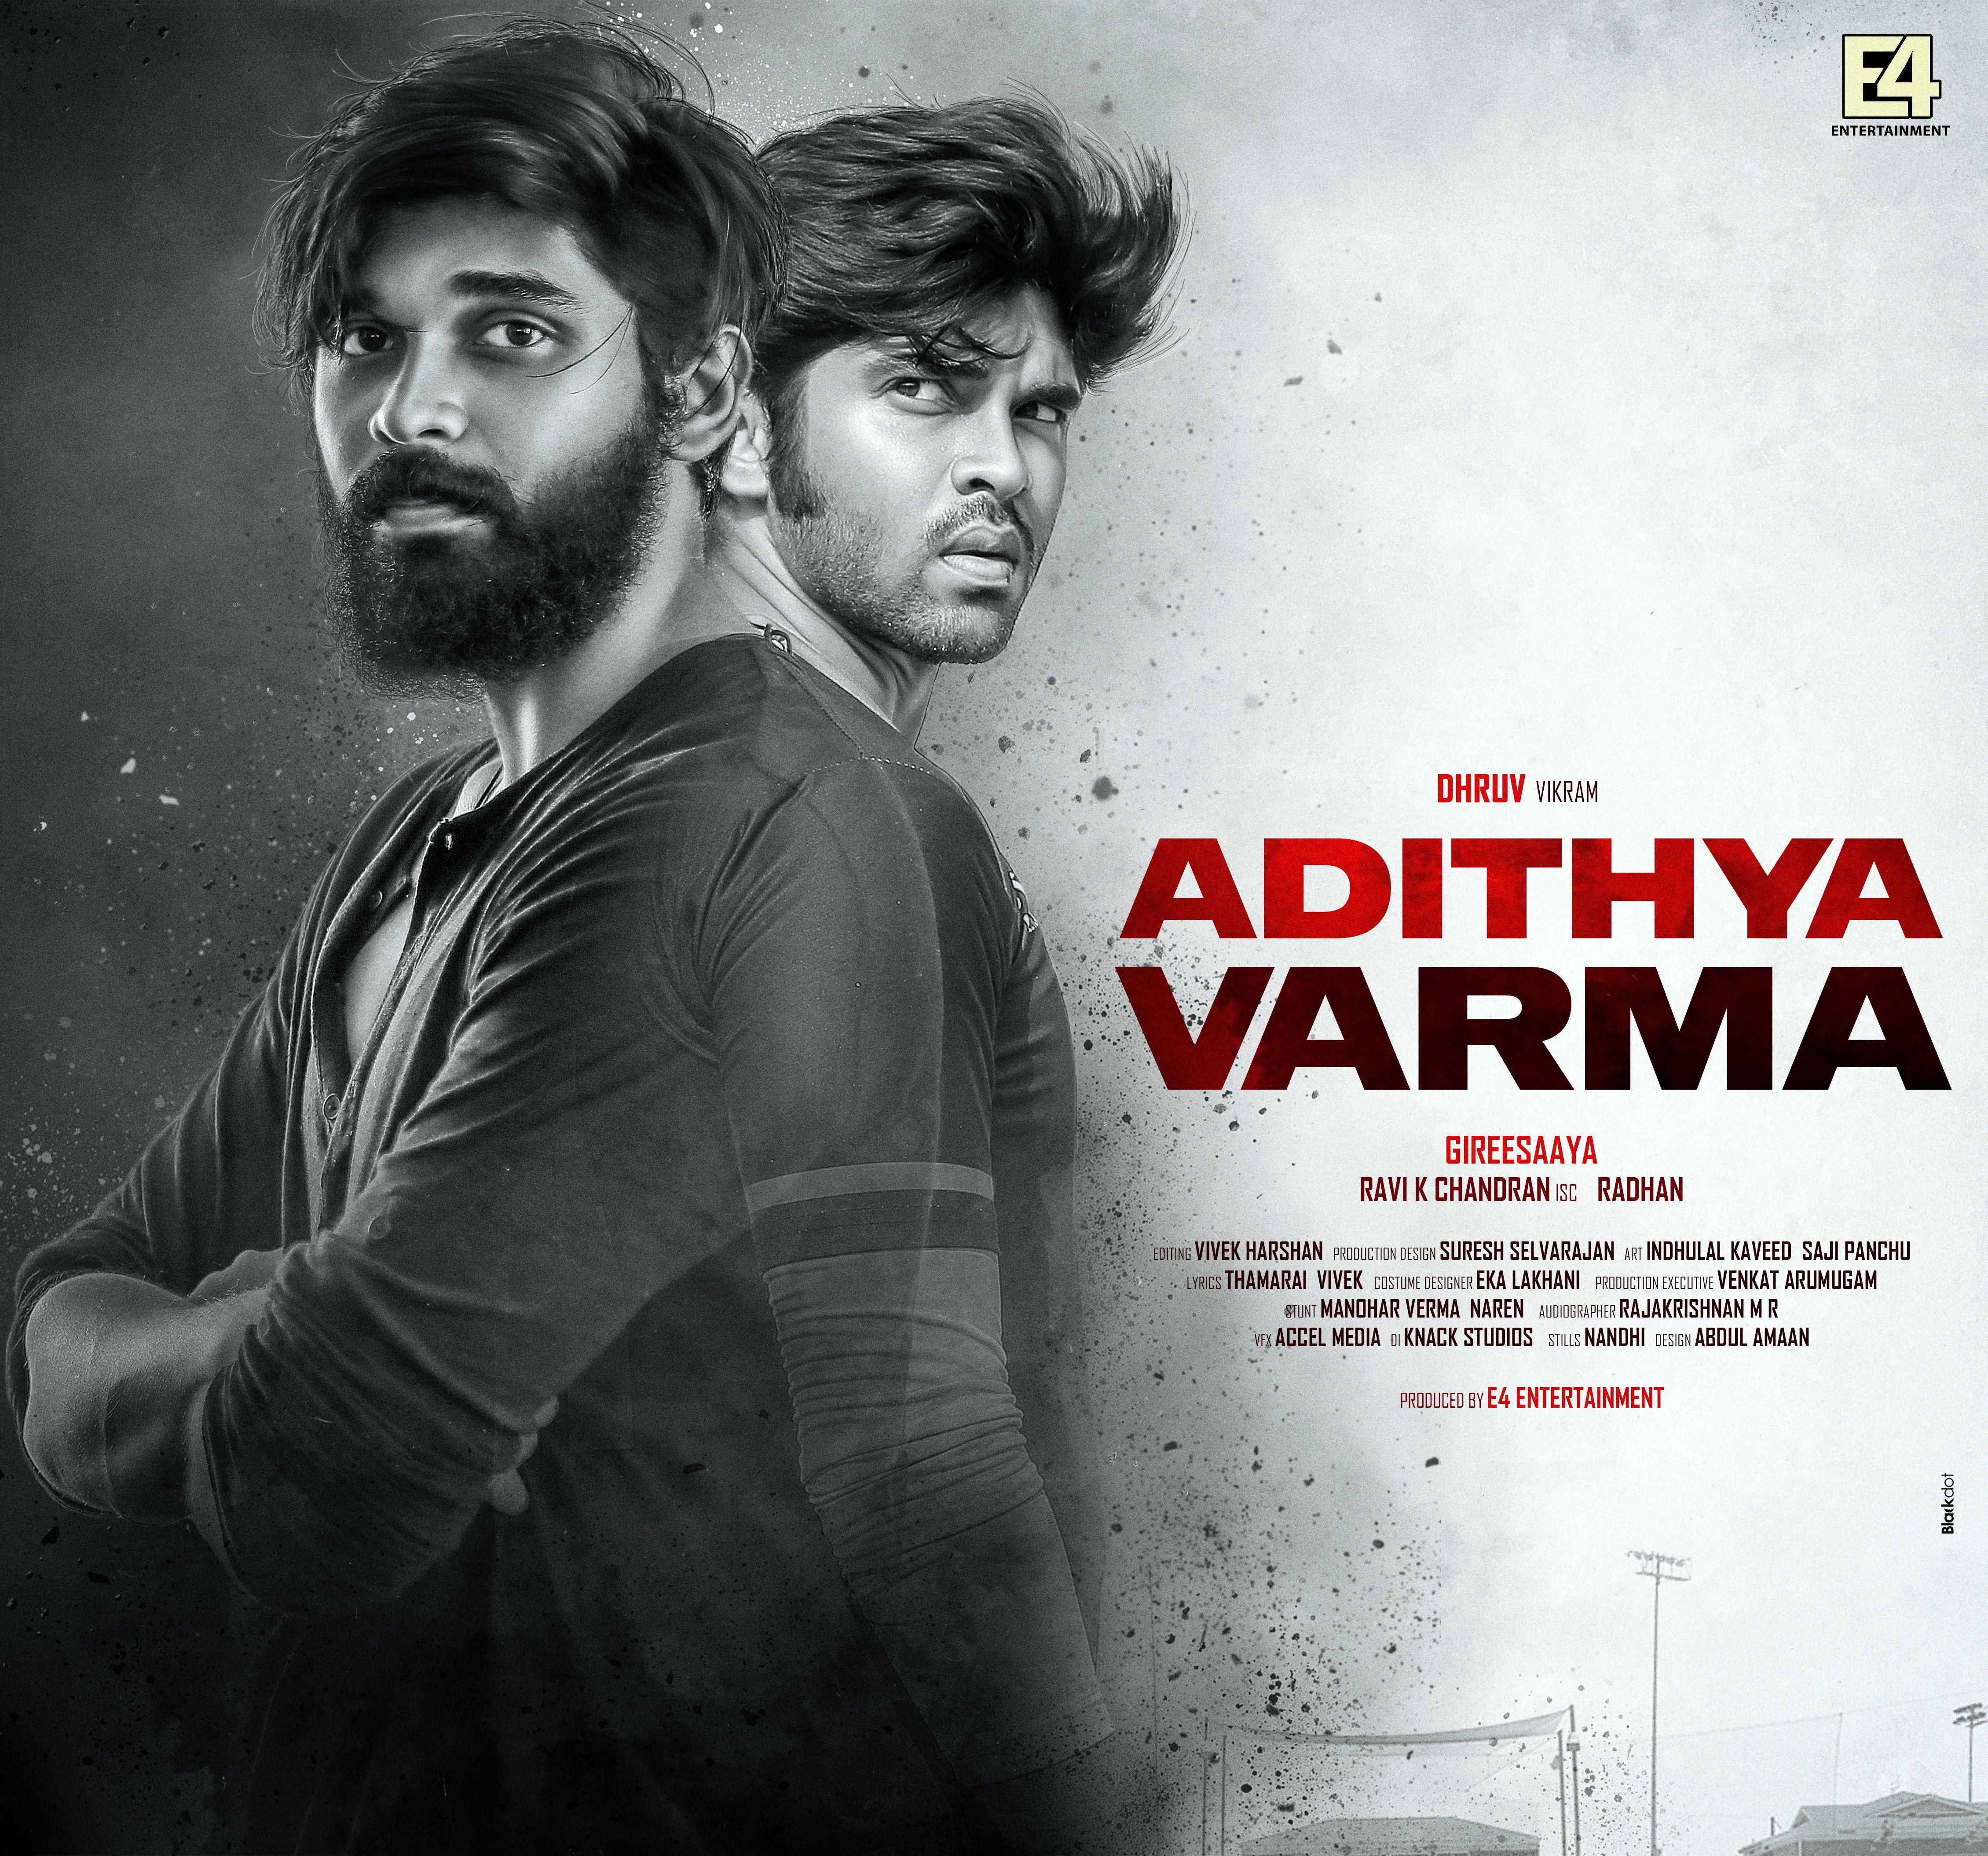 Adithya Varma Wallpapers Top Free Adithya Varma Backgrounds Wallpaperaccess